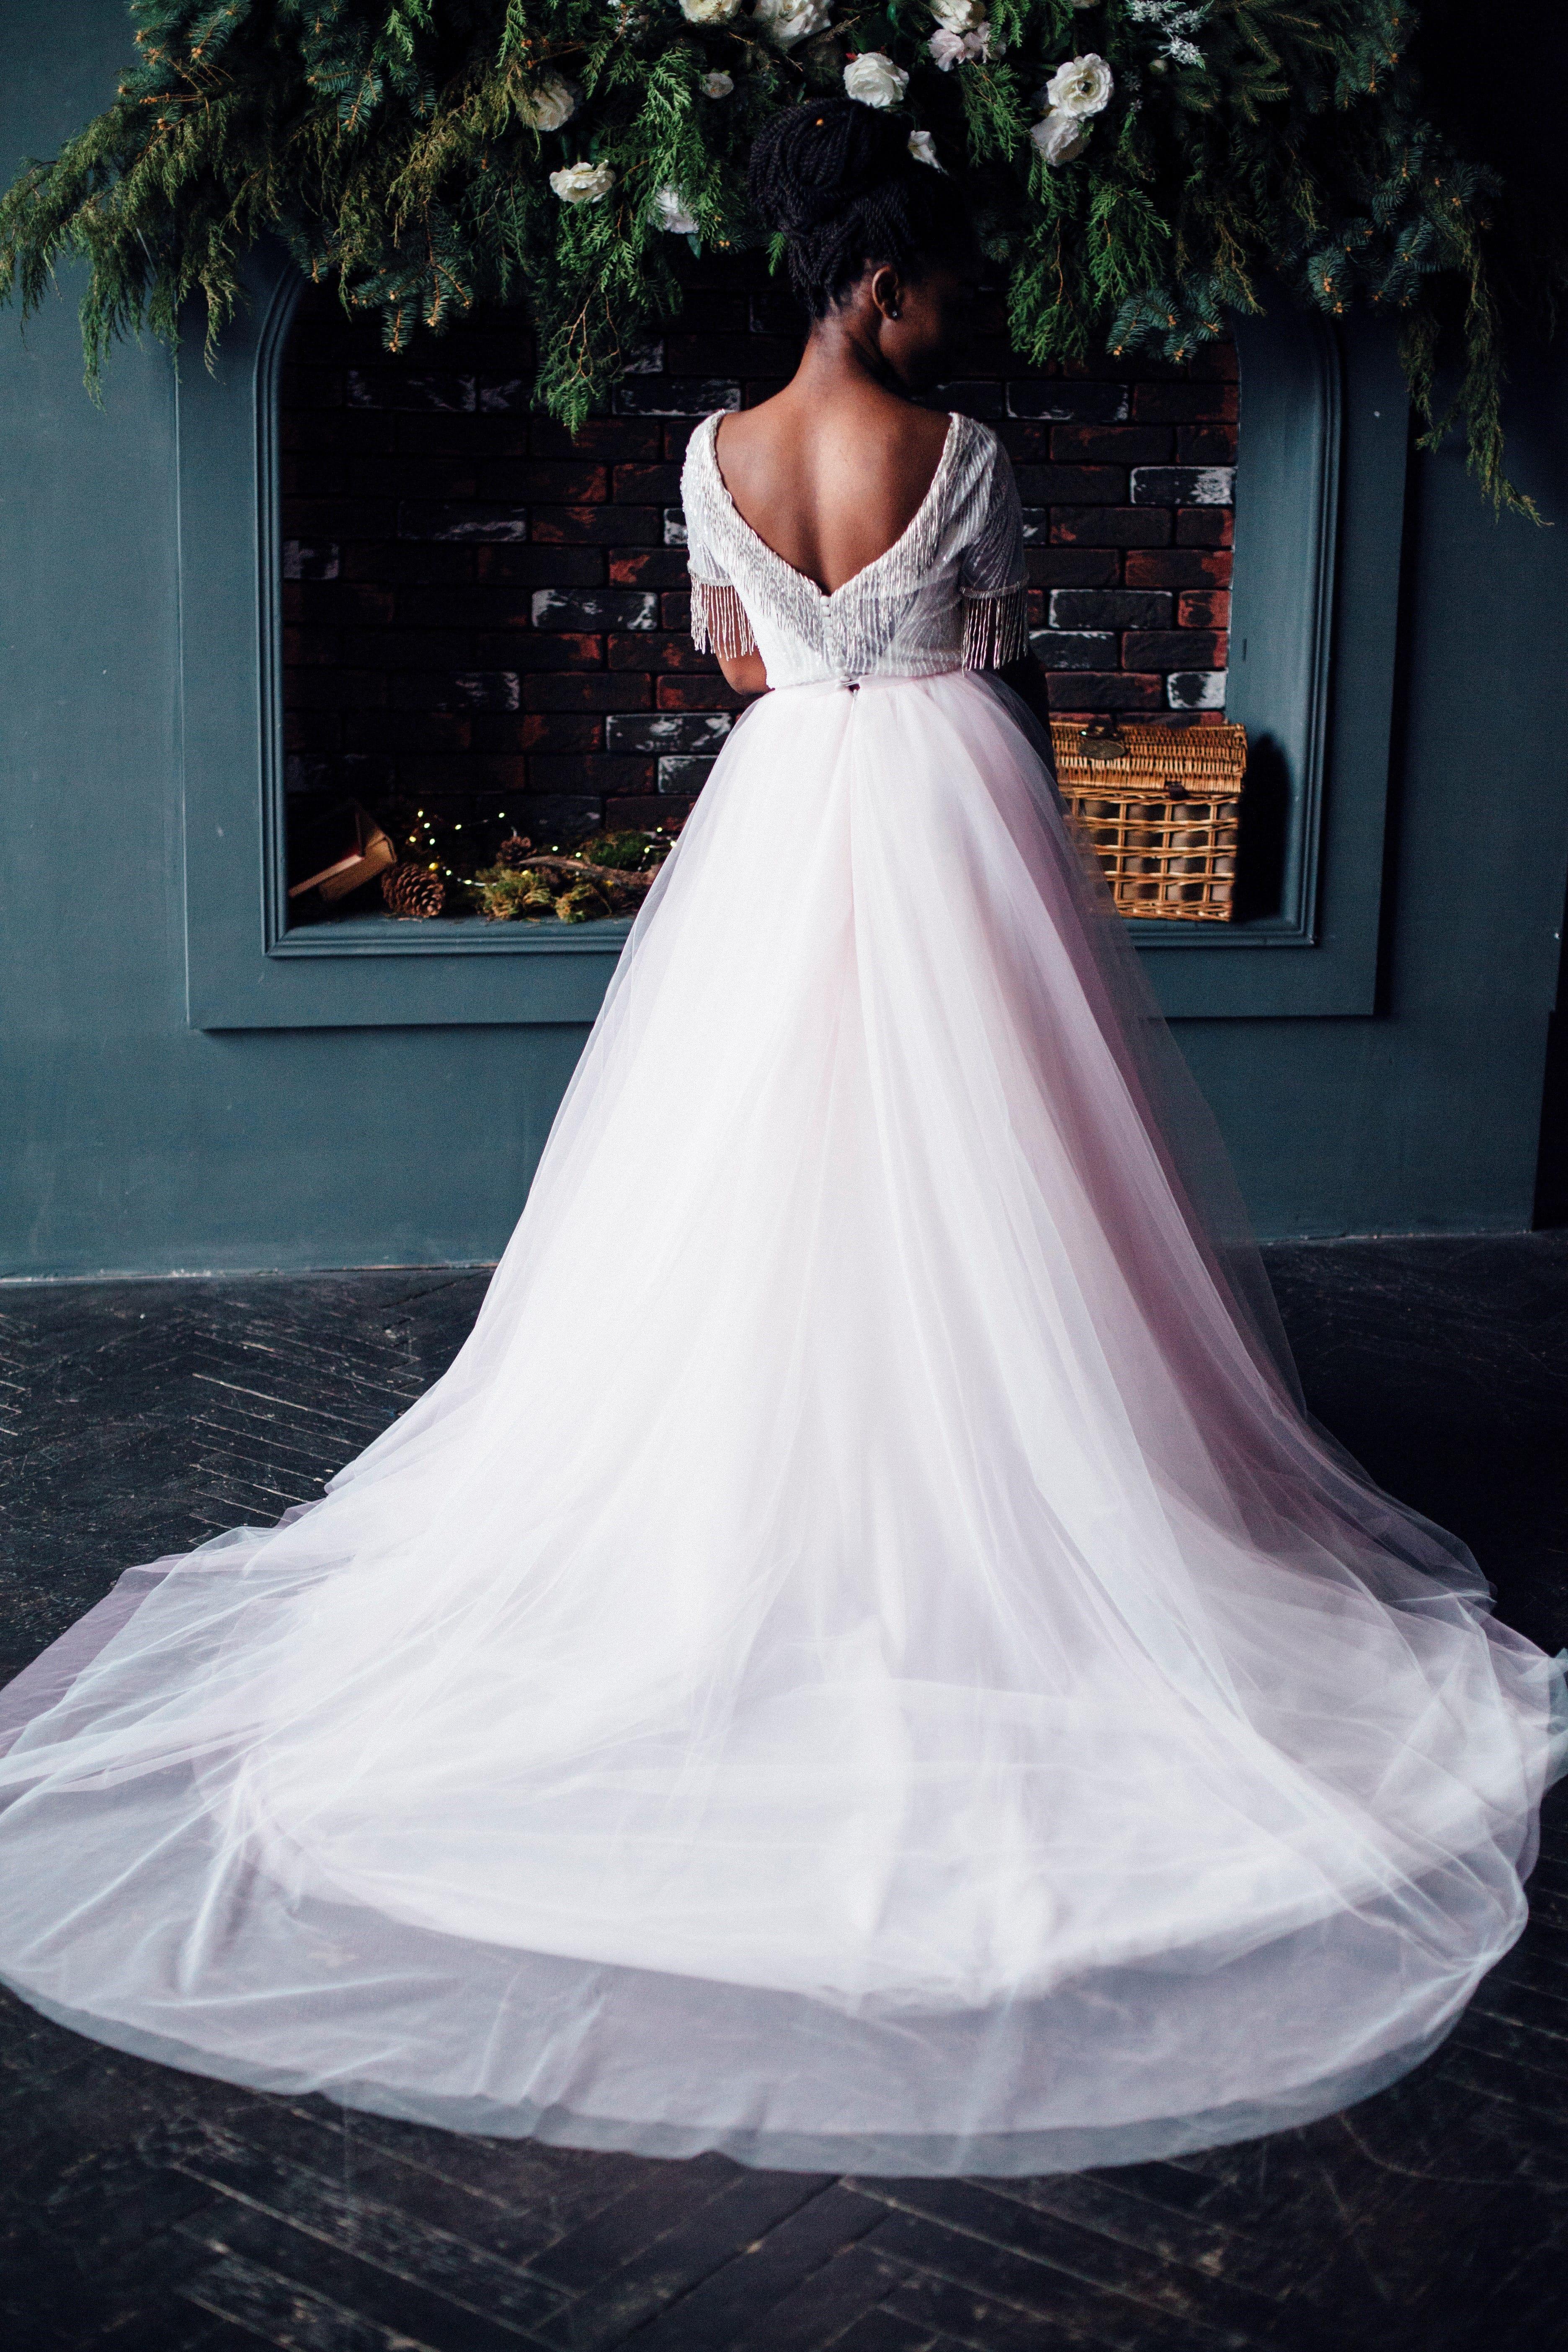 Свадебное платье JOYCE, коллекция THE ABSOLUTE LOVE, бренд RARE BRIDAL, фото 4